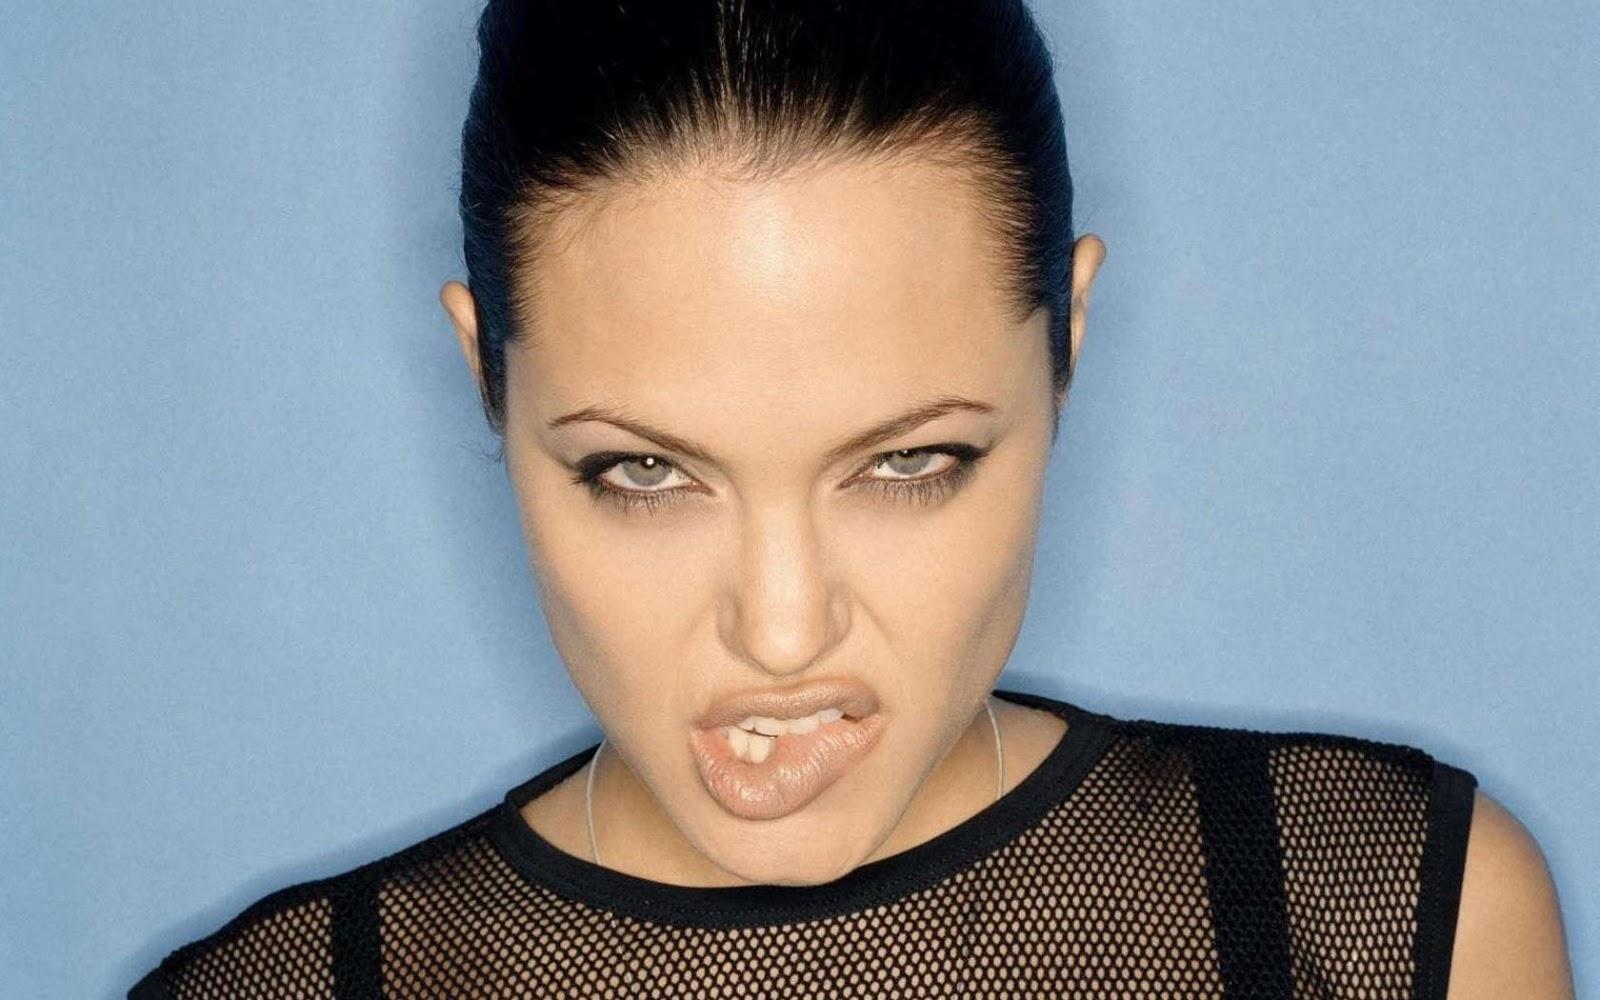 http://3.bp.blogspot.com/-sLPPHAMrsTI/TwqOtNInhmI/AAAAAAAABmU/CZxSJvE2VUk/s1600/AngelinaJolie_hot_lips1.1+%25284%2529.jpg